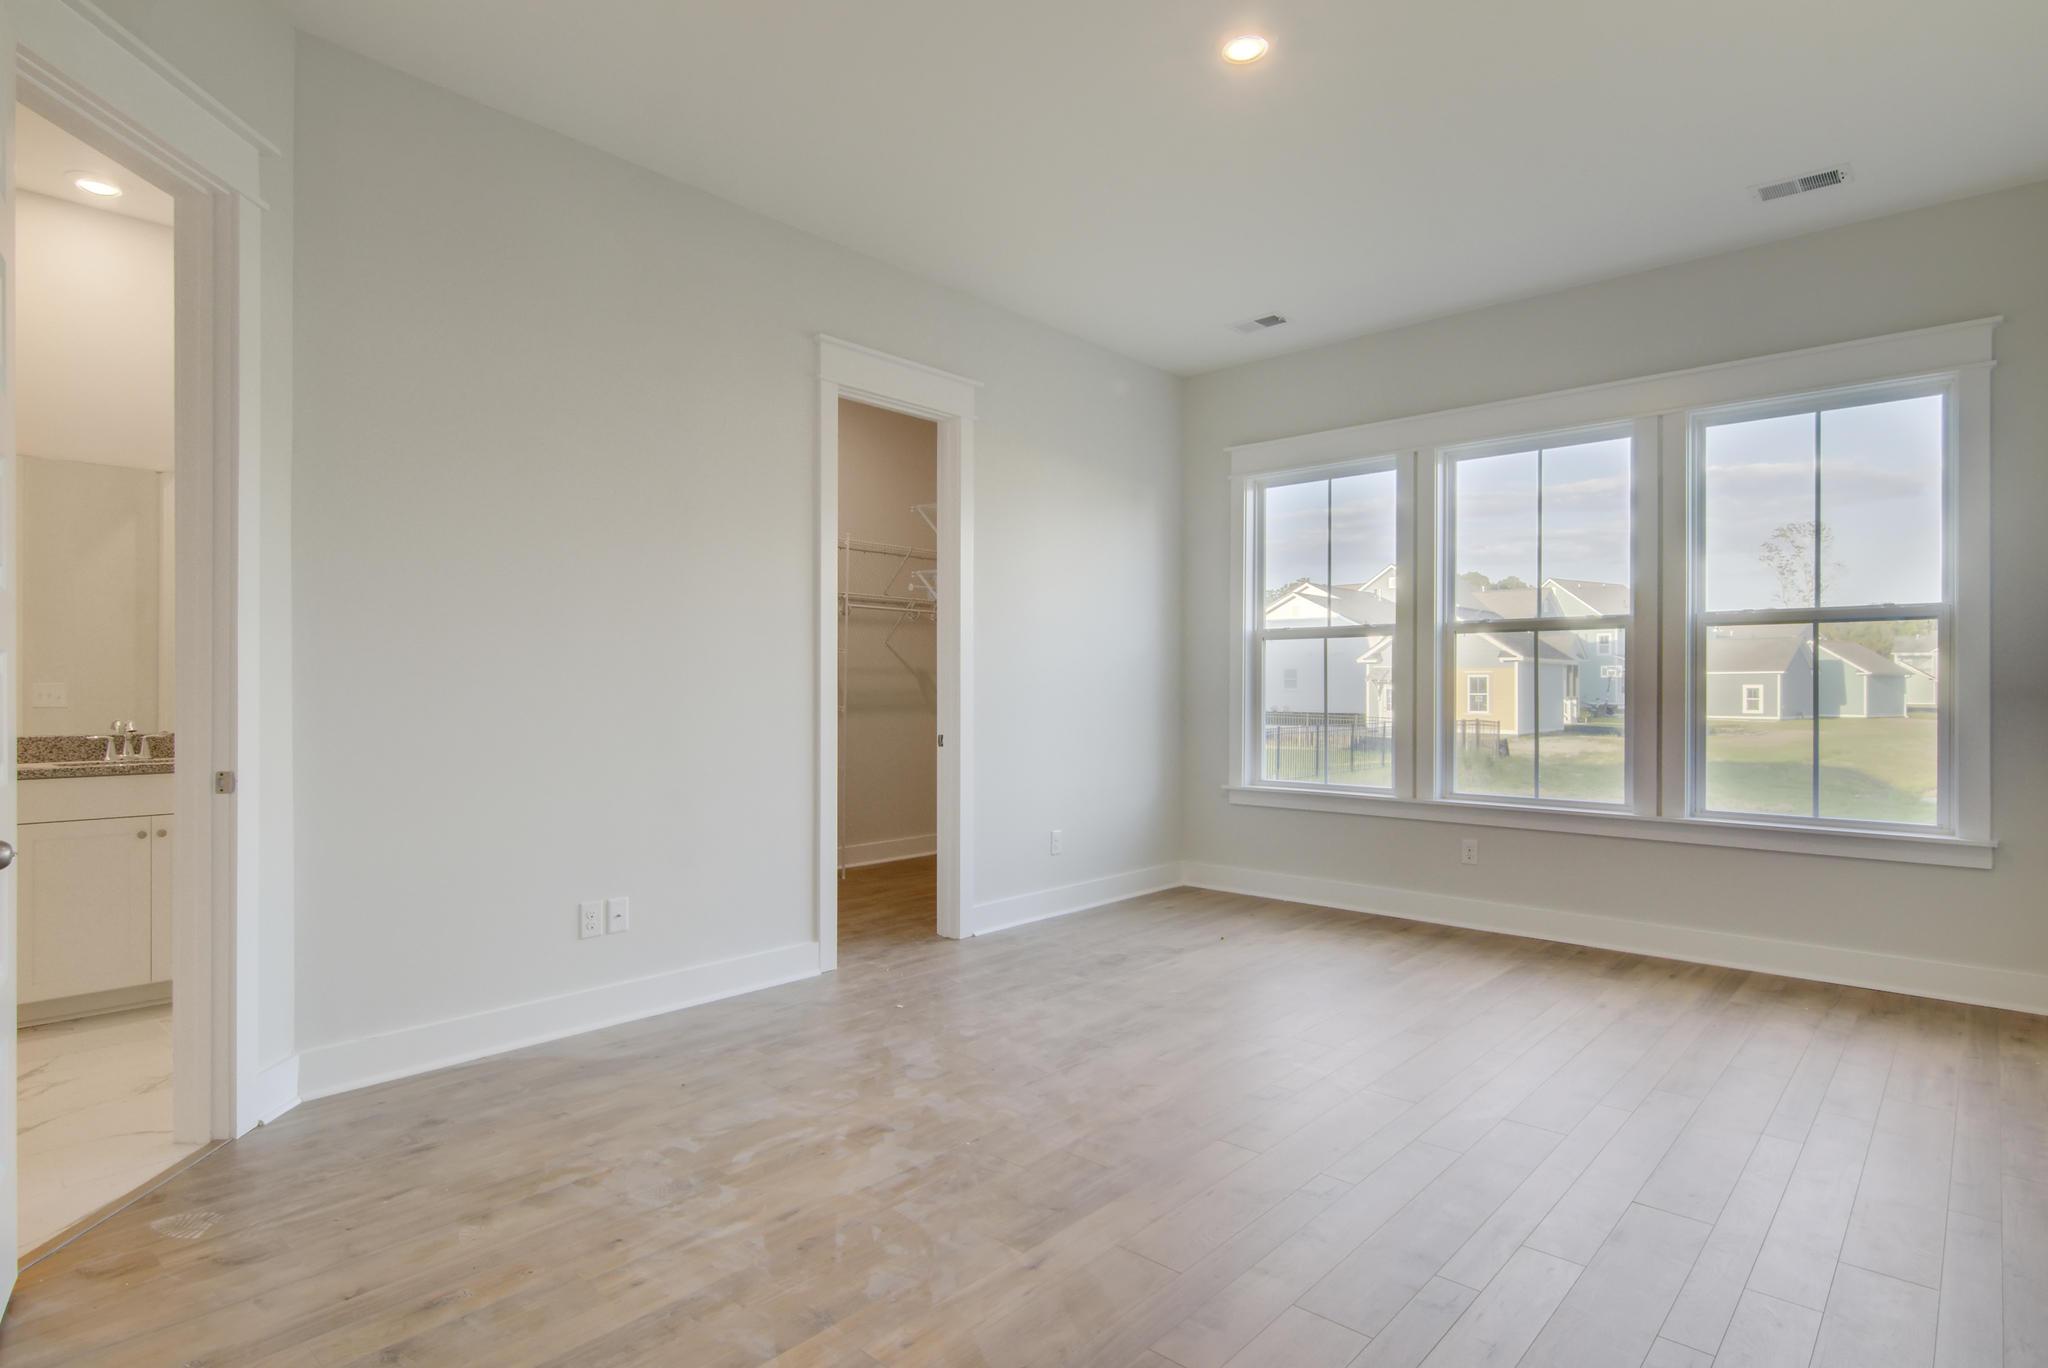 Carolina Park Homes For Sale - 1734 Sandy Brook, Mount Pleasant, SC - 8